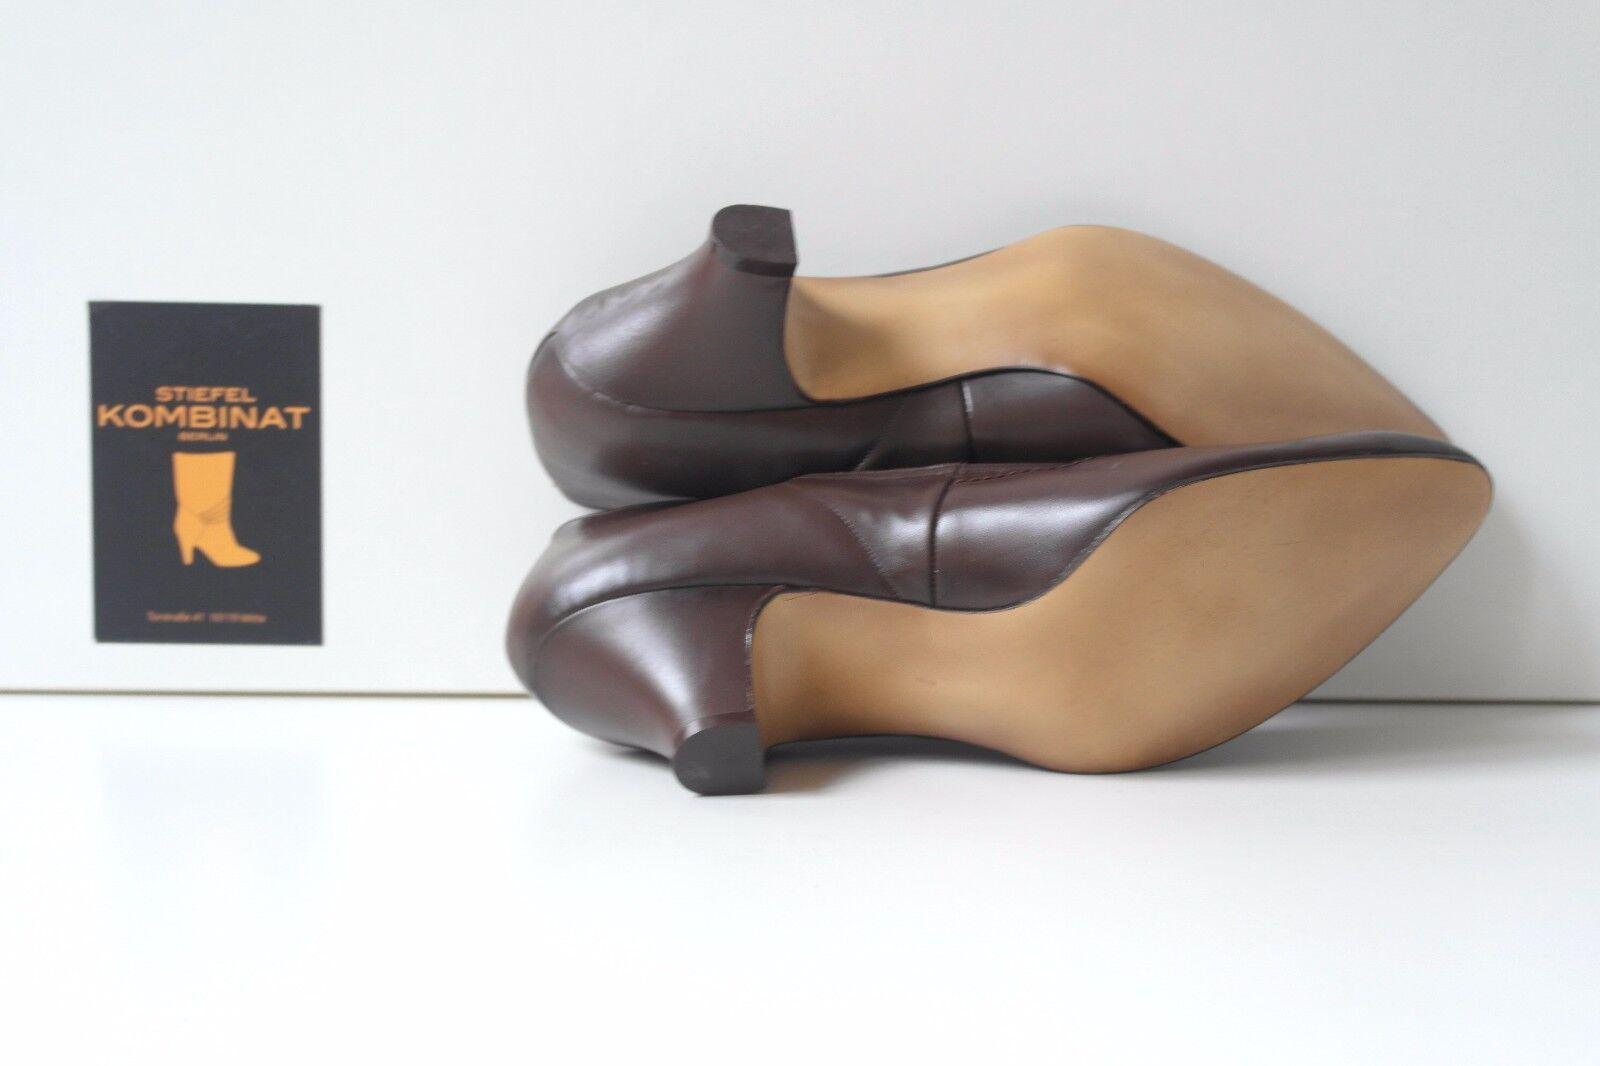 Rheinberger Damen Pumps Getta NOS Schuhe EUR TRUE VINTAGE Halbschuhe Slipper EUR Schuhe 41 d23e1f